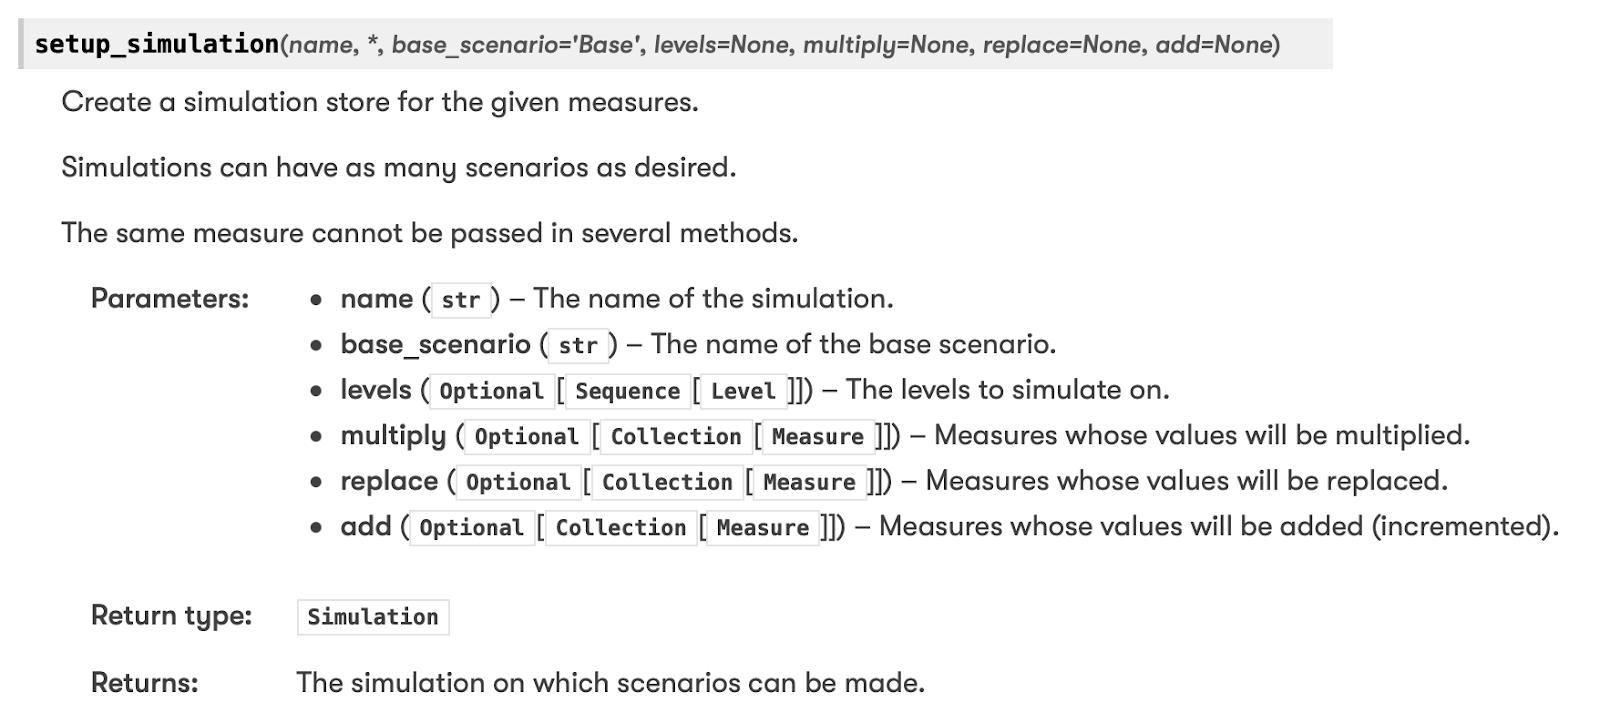 Setup Simulation argument documentation